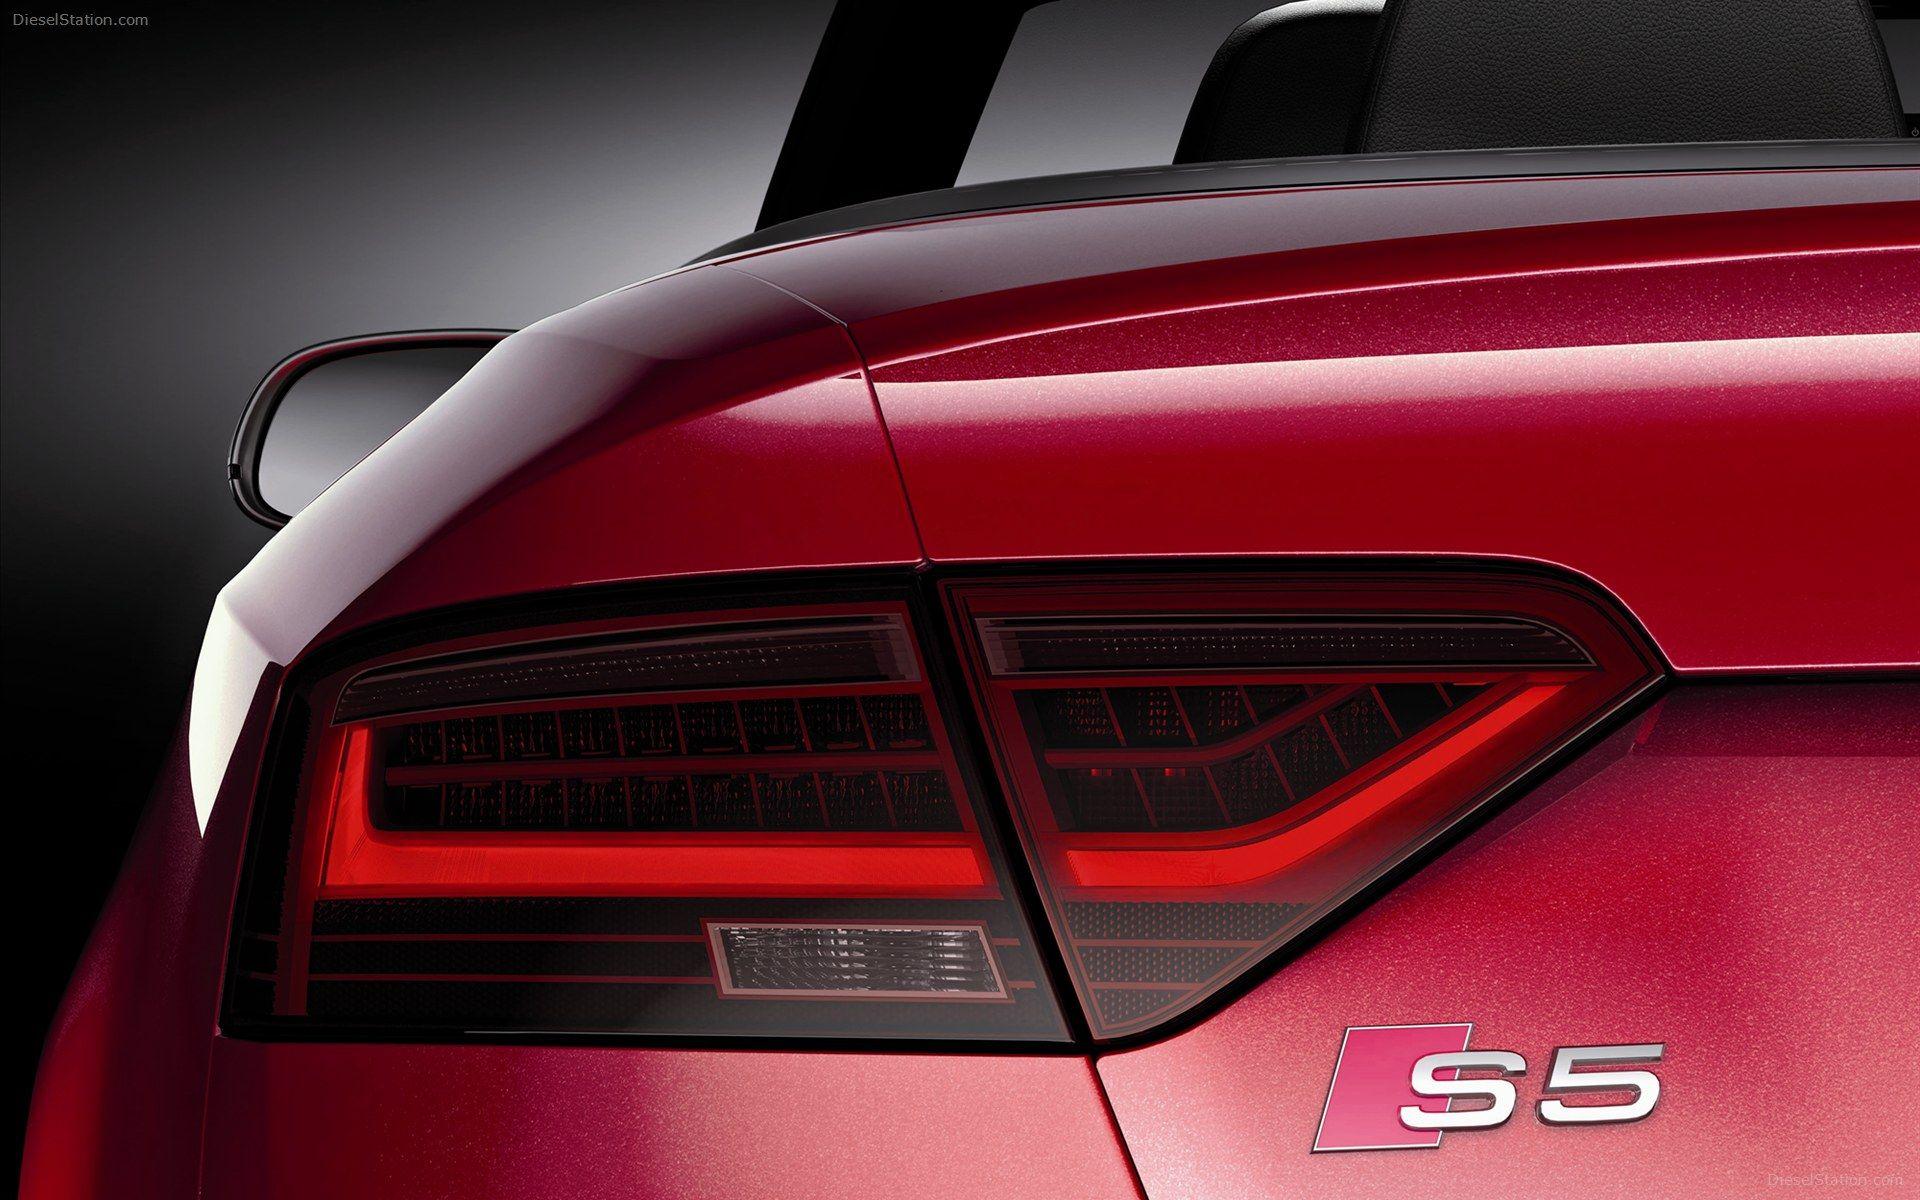 Download Audi Rs Iphone Audi S5 Audi Cabriolets